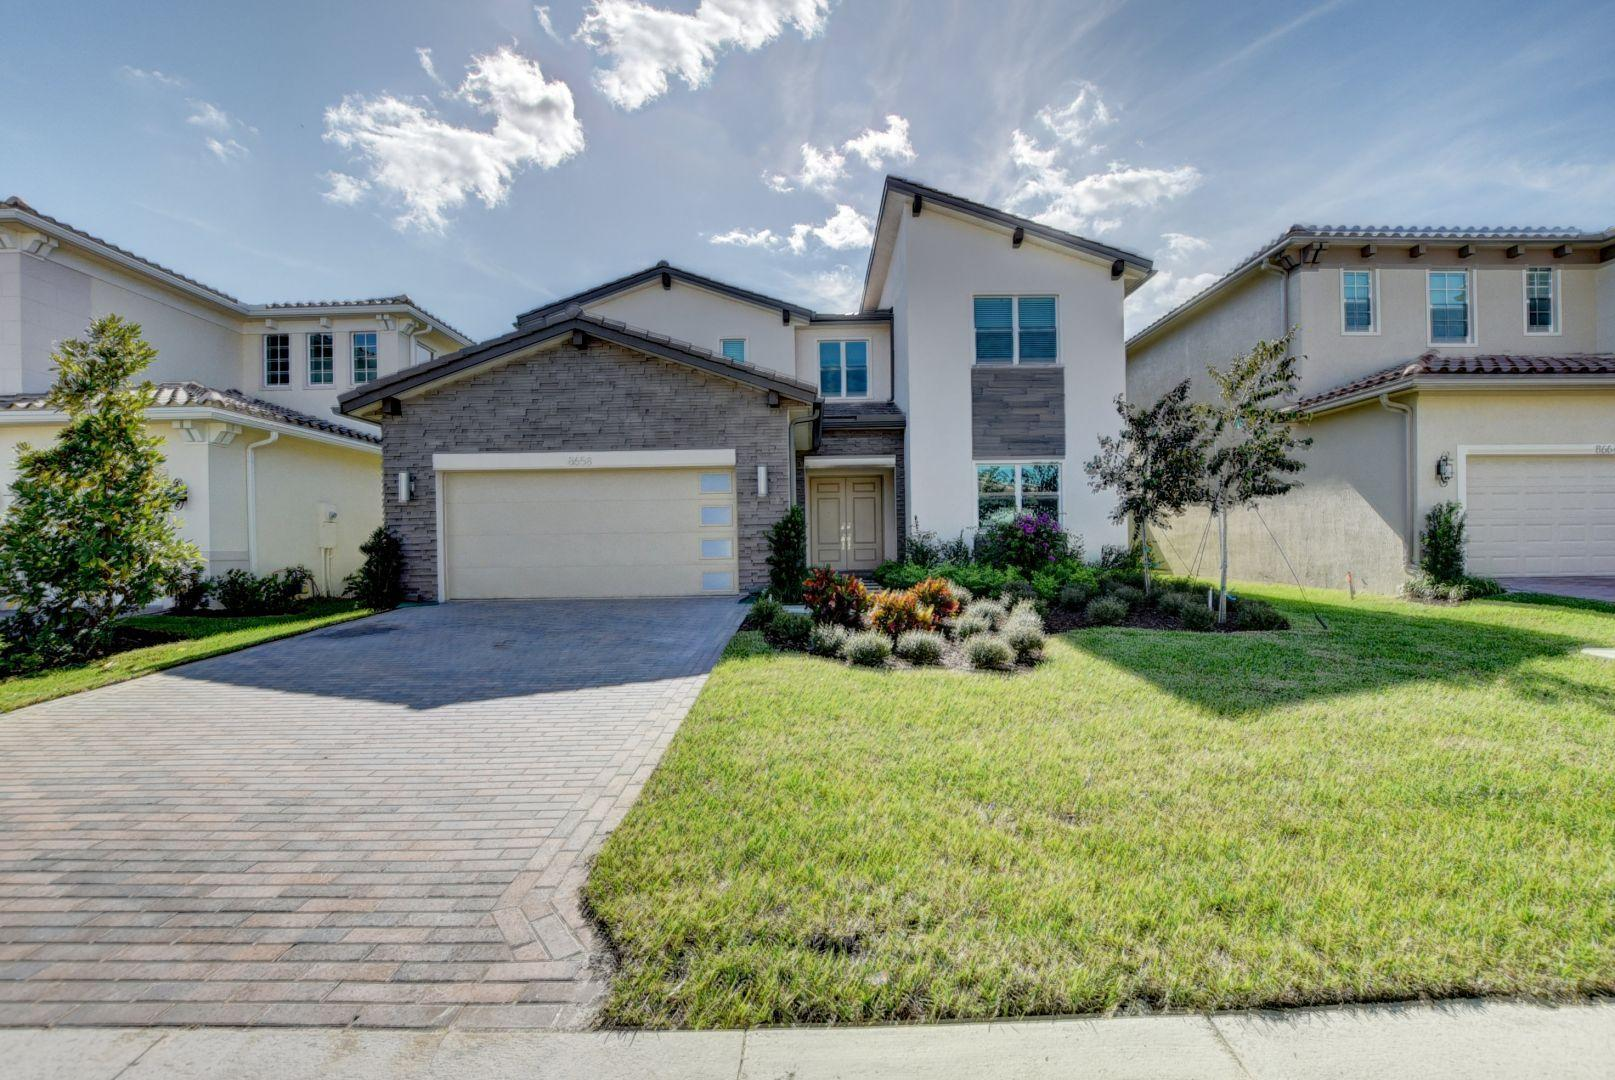 Photo of 8658 Dumford Lane, Lake Worth, FL 33467